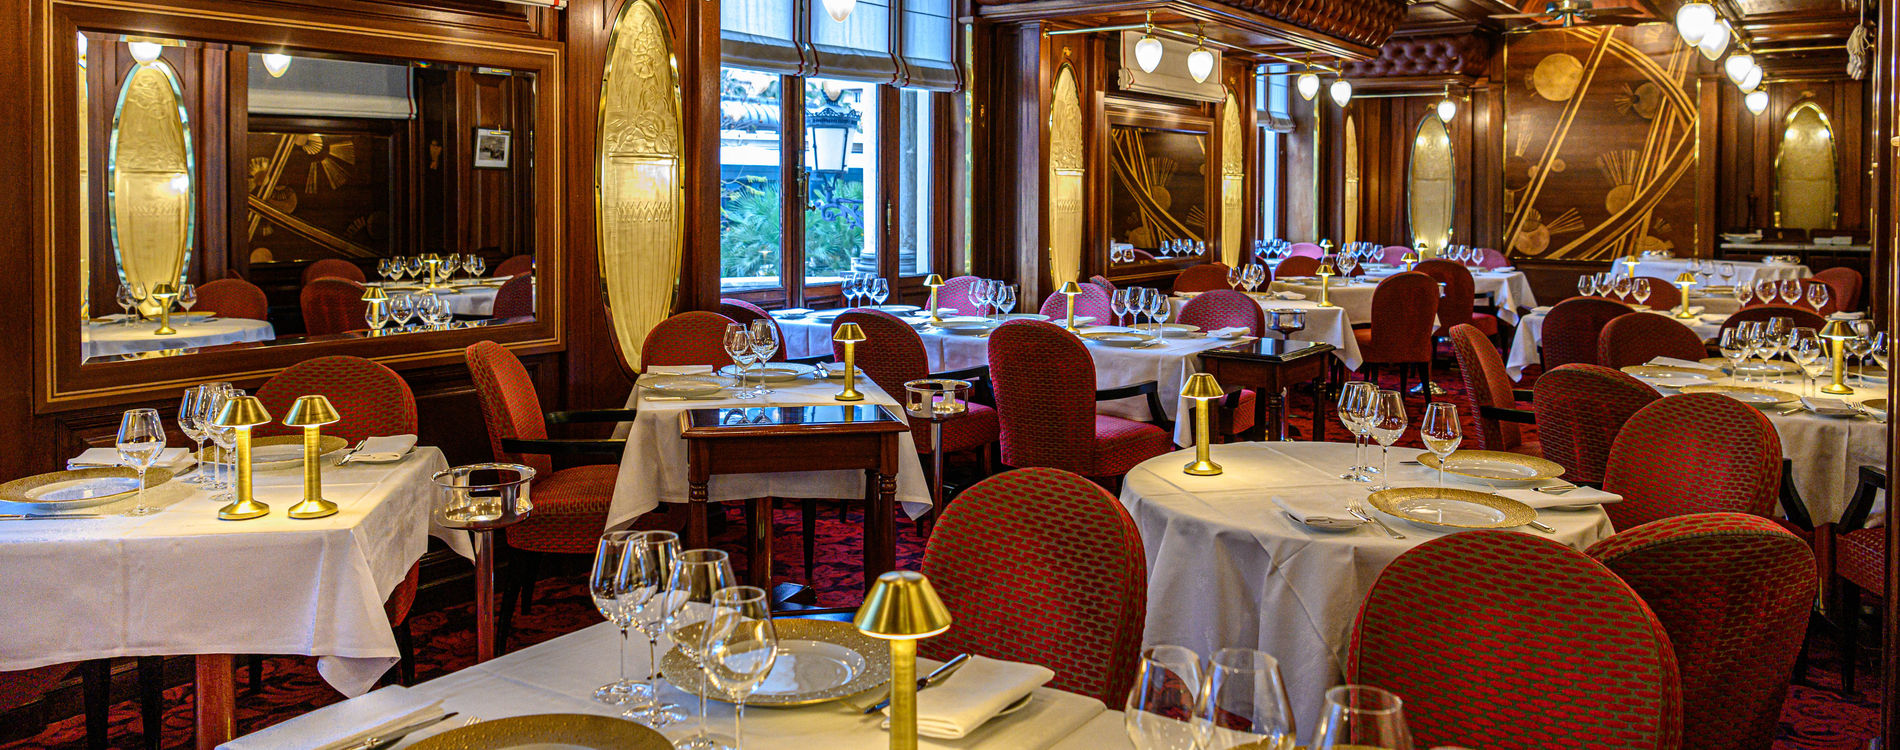 Casino de Monte-Carlo - Restaurant le Train Bleu - 2019